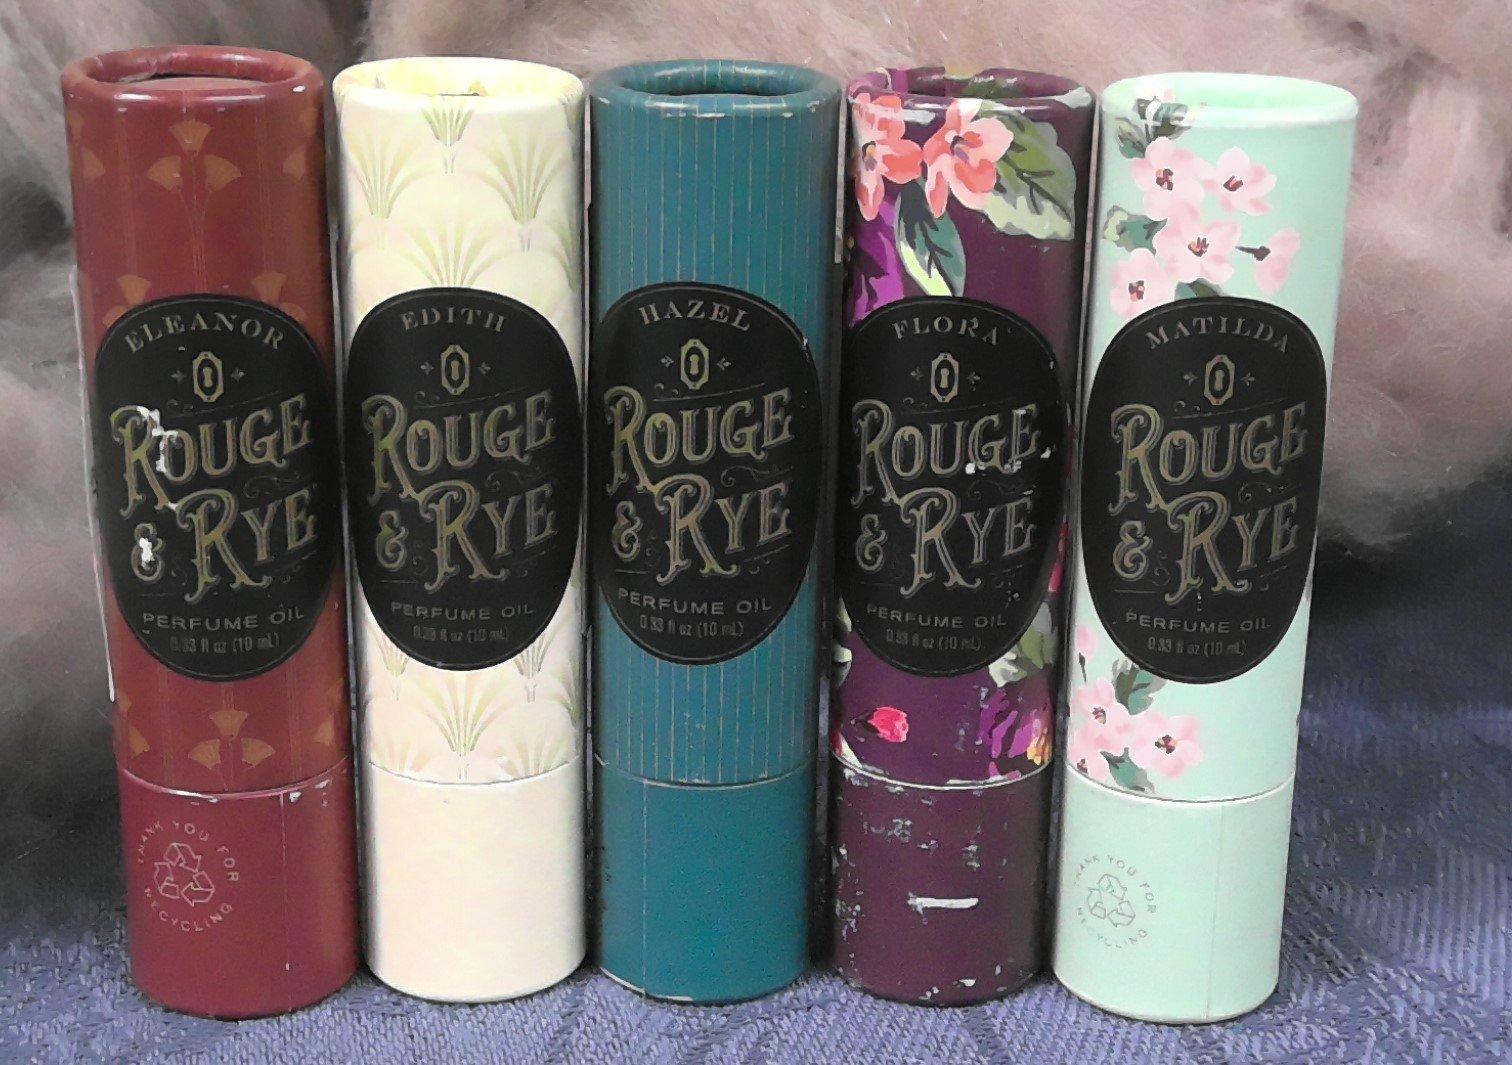 Rouge & Rye Perfume - Variety of Fragrances